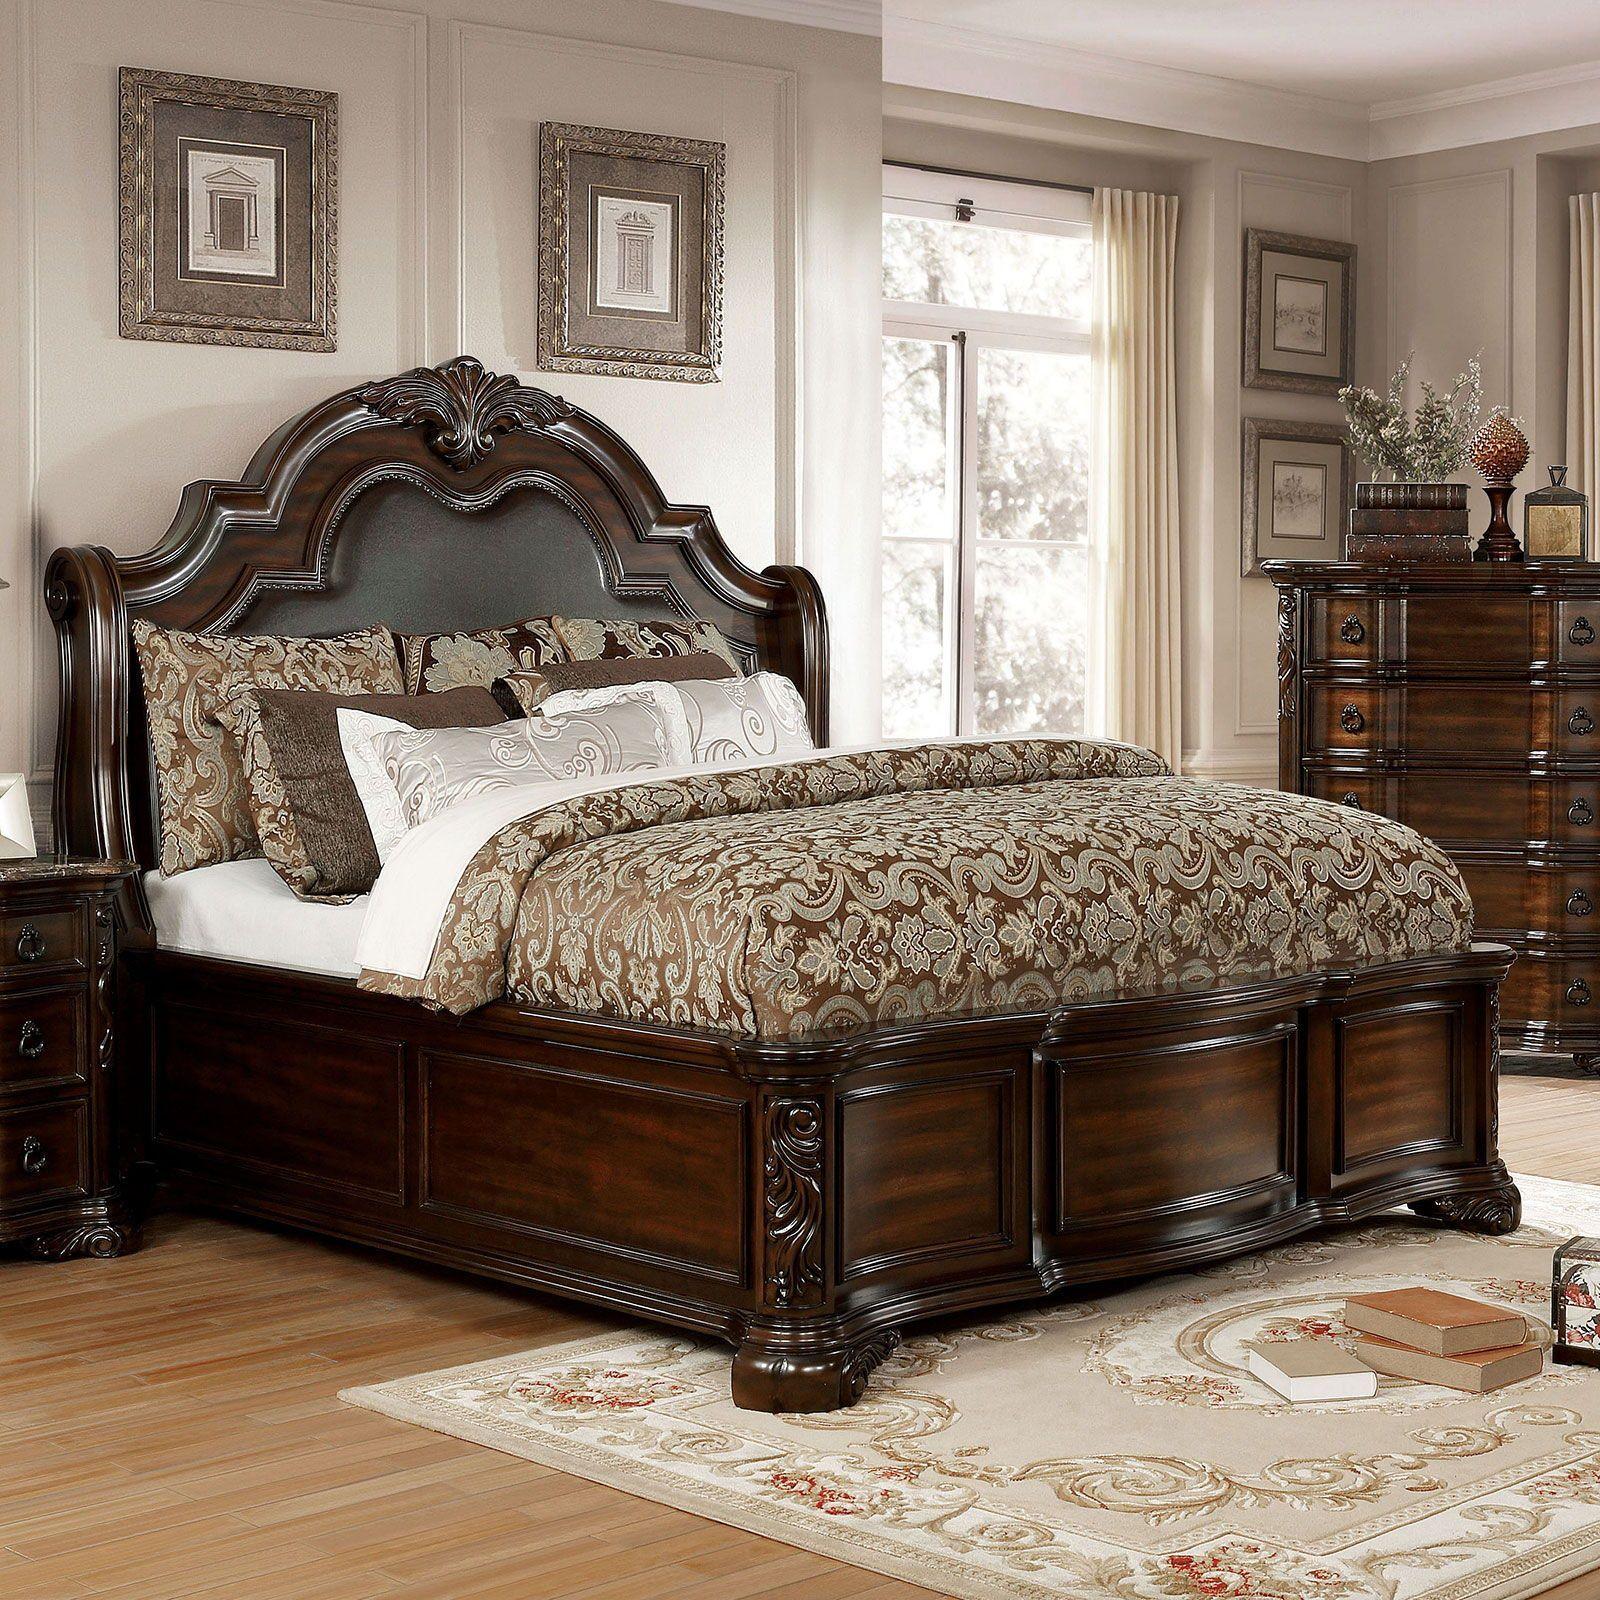 Niketas Cal King Bed Brown Cherrycalifornia King In 2021 Upholstered Sleigh Bed Bedroom Set Tufted Headboard Bed